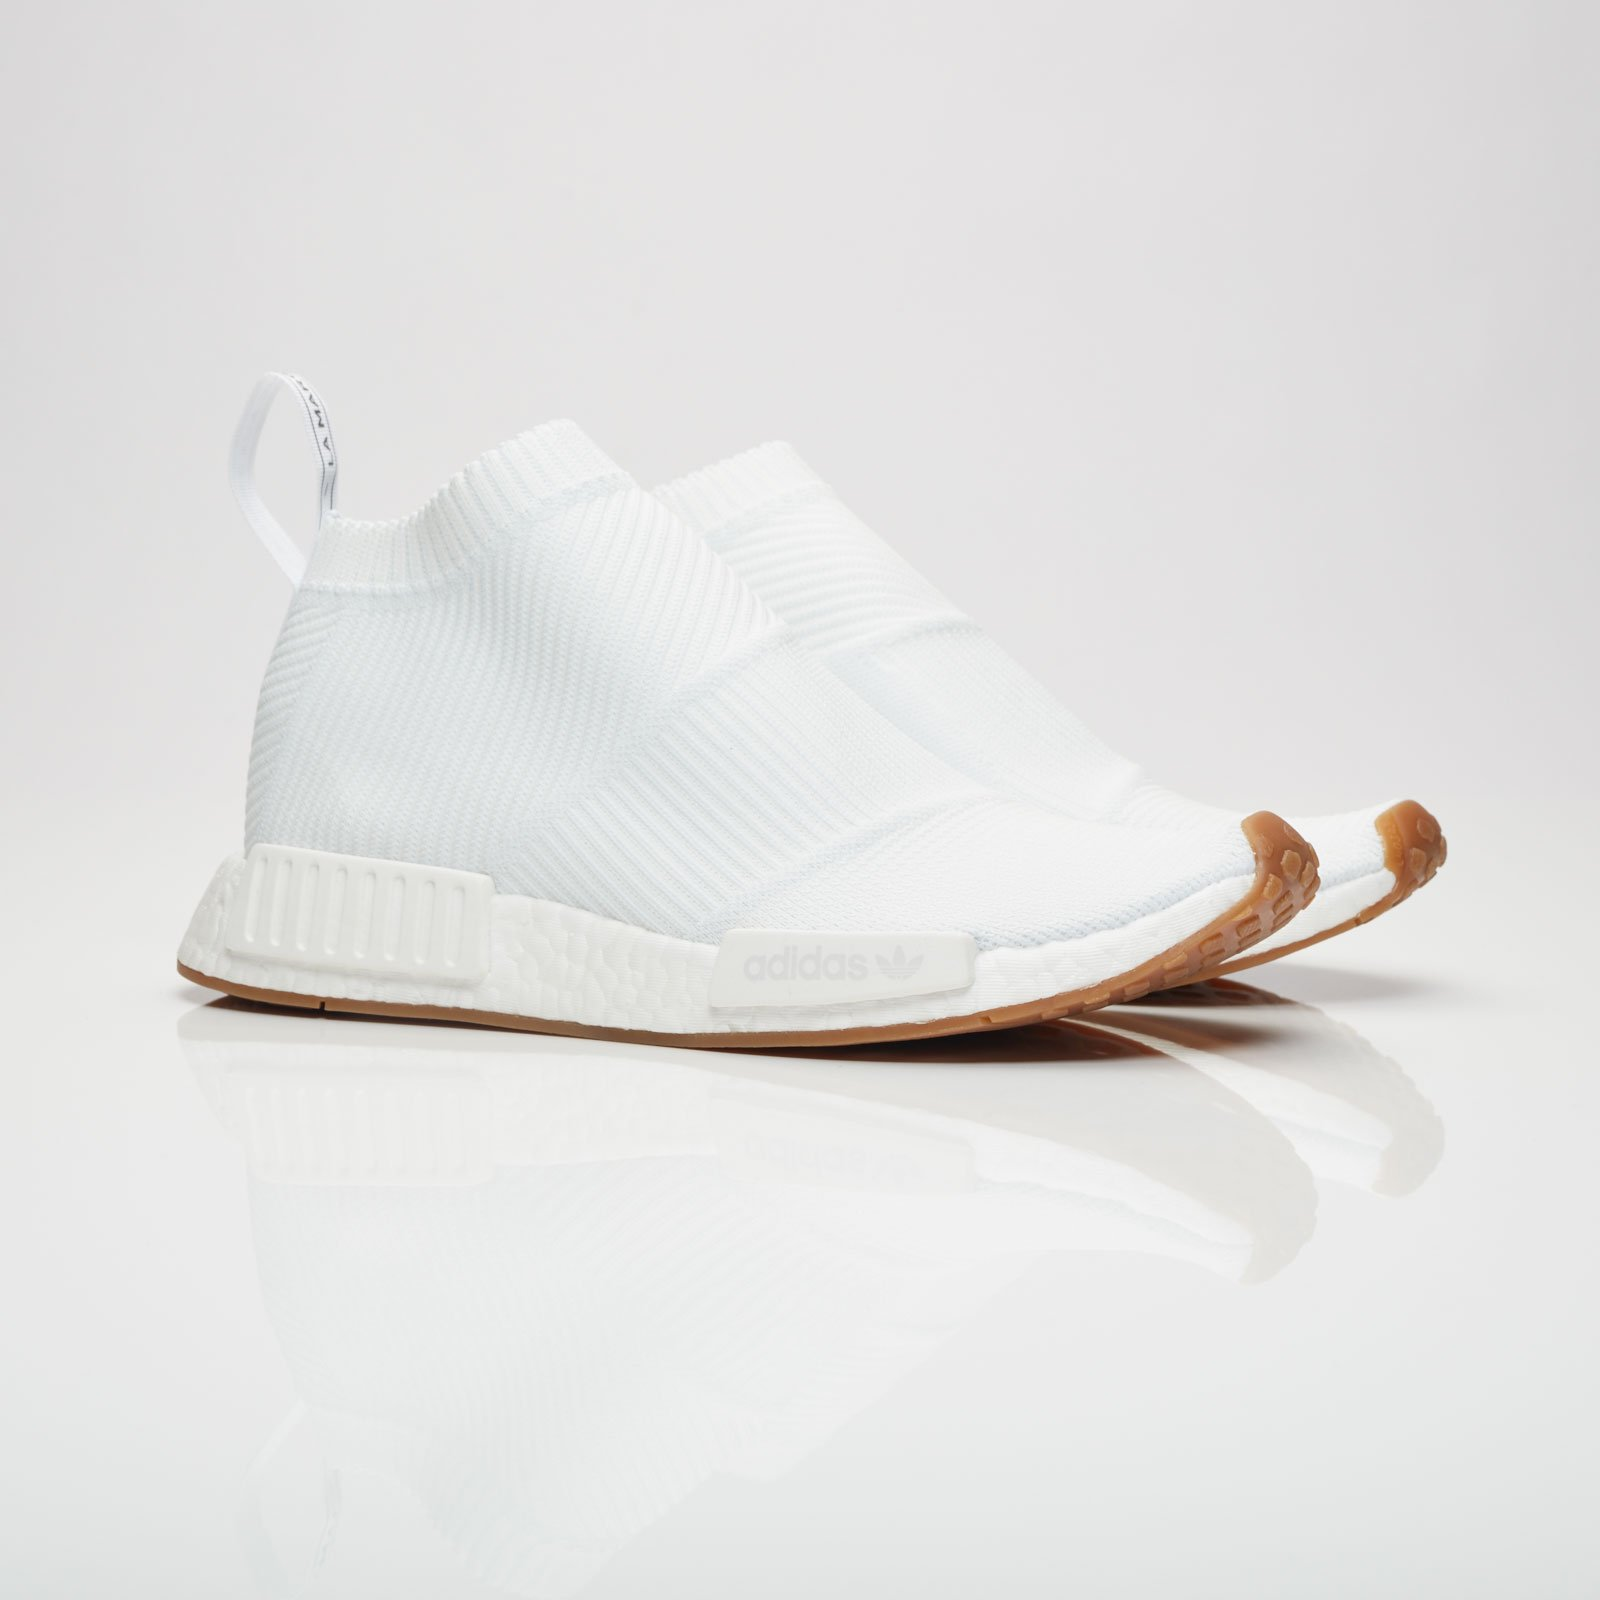 aac9b378786c8 adidas Nmd Cs1 Pk - Ba7208 - Sneakersnstuff